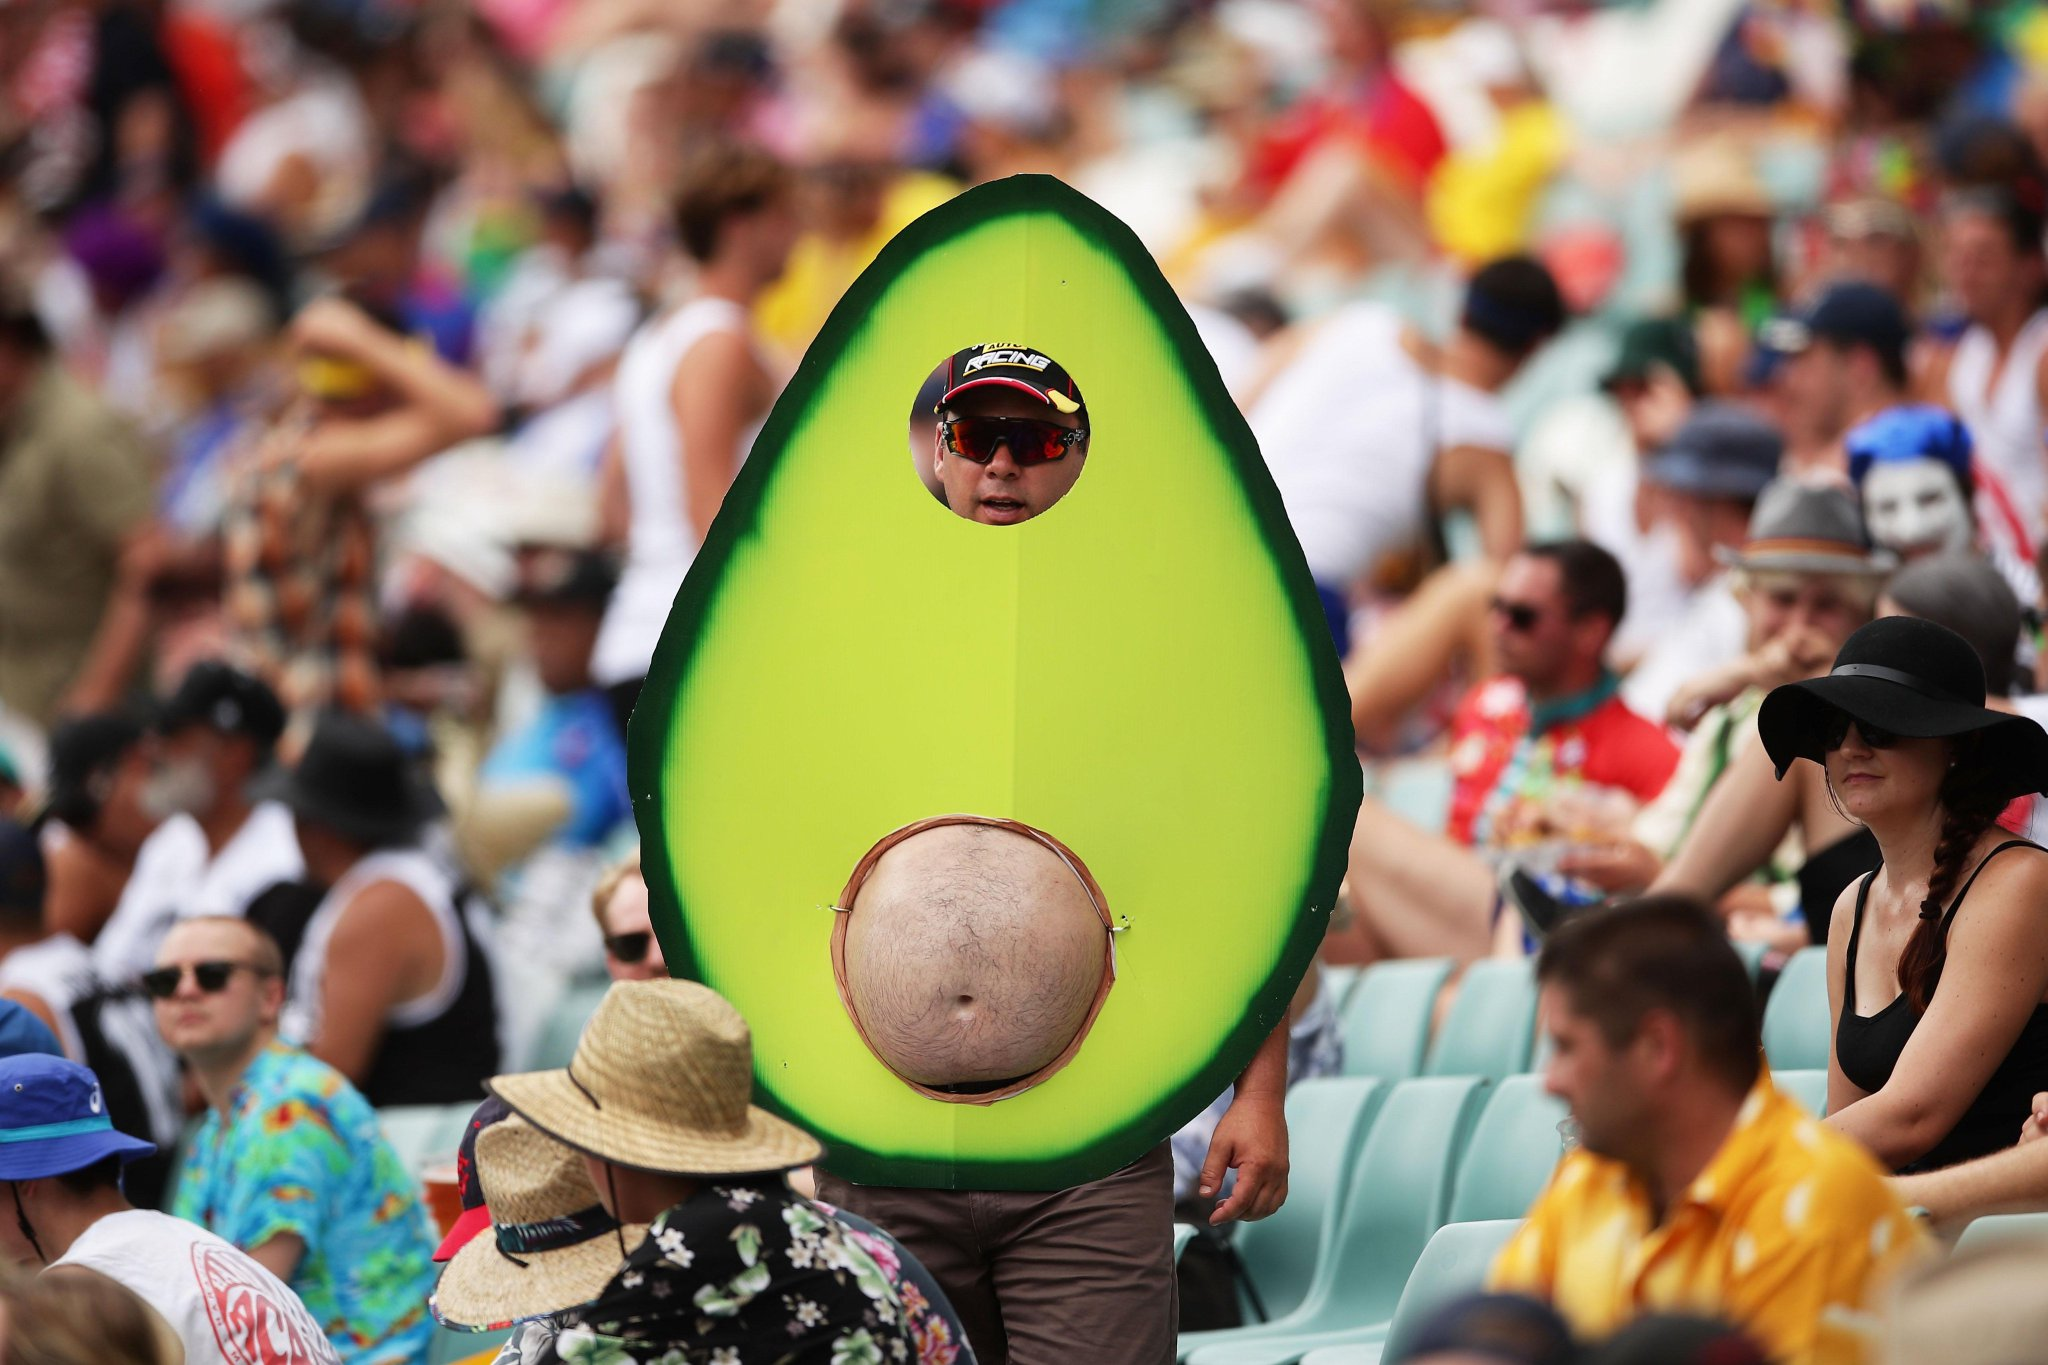 RT @WorldRugby7s: Best. Costume. Ever. 🥑  #Sydney7s https://t.co/e5DG8EyuOc